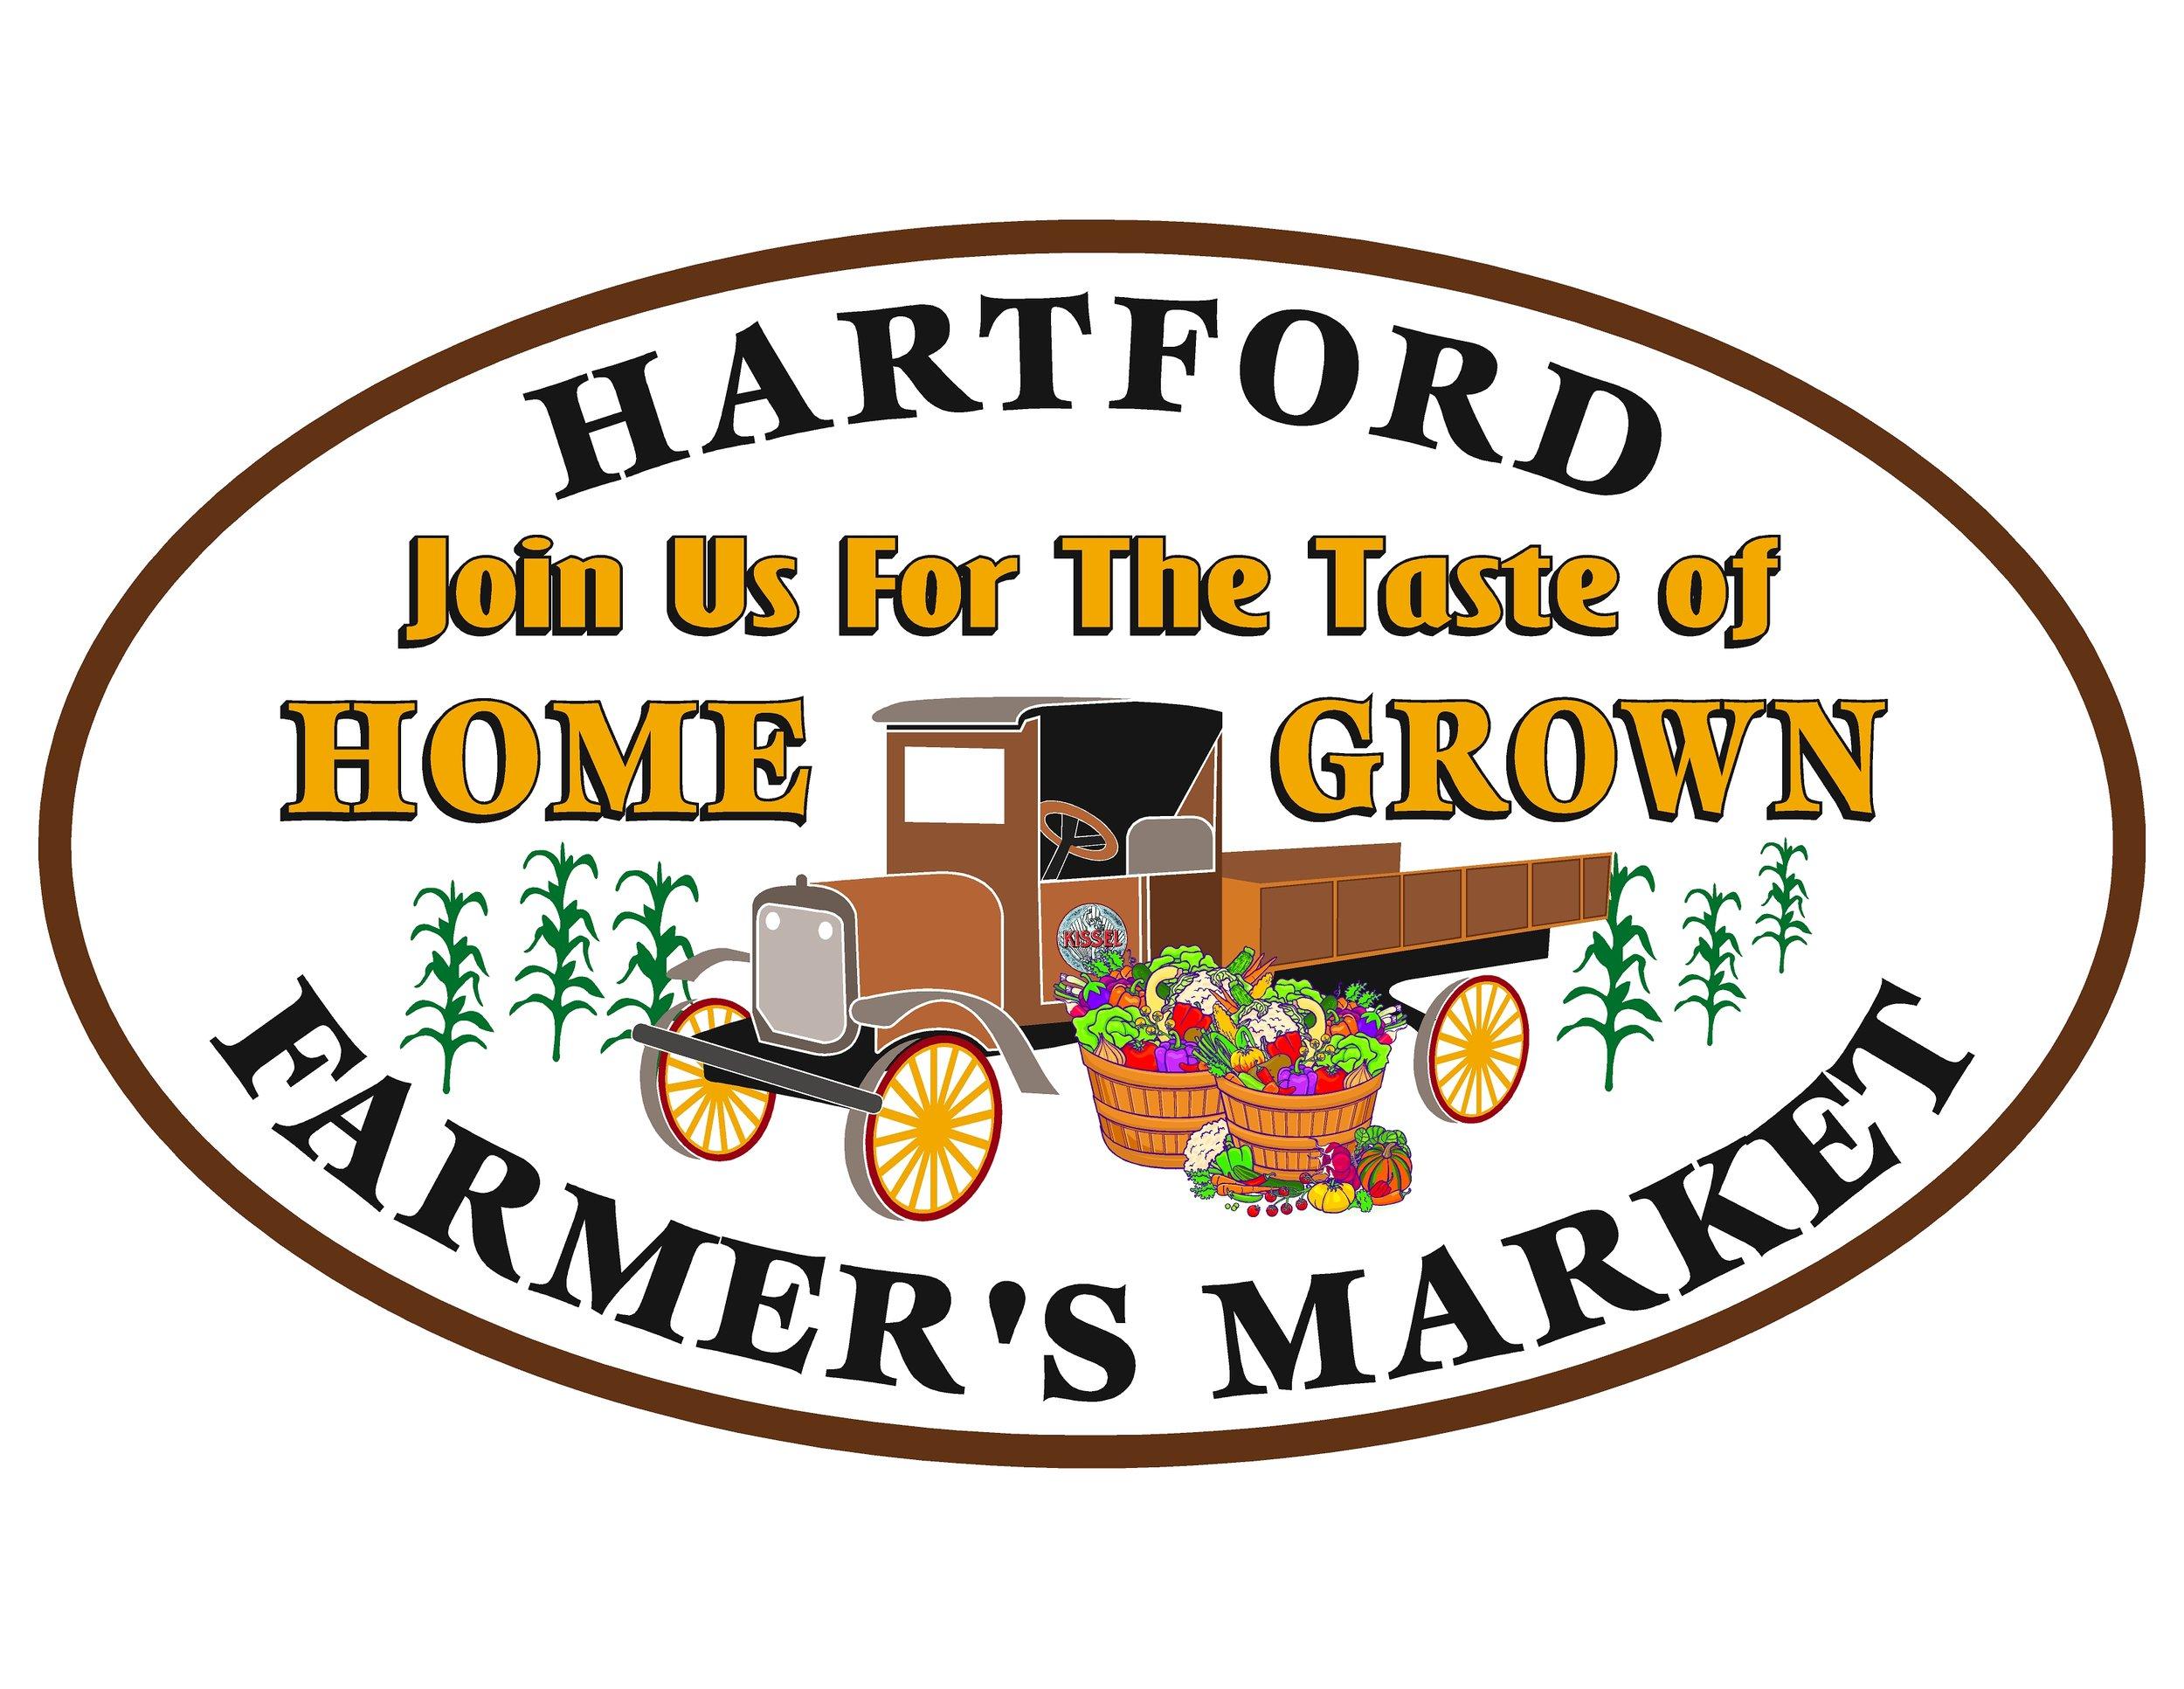 HartfordFarmersMarket-FinalLogo2016.jpg